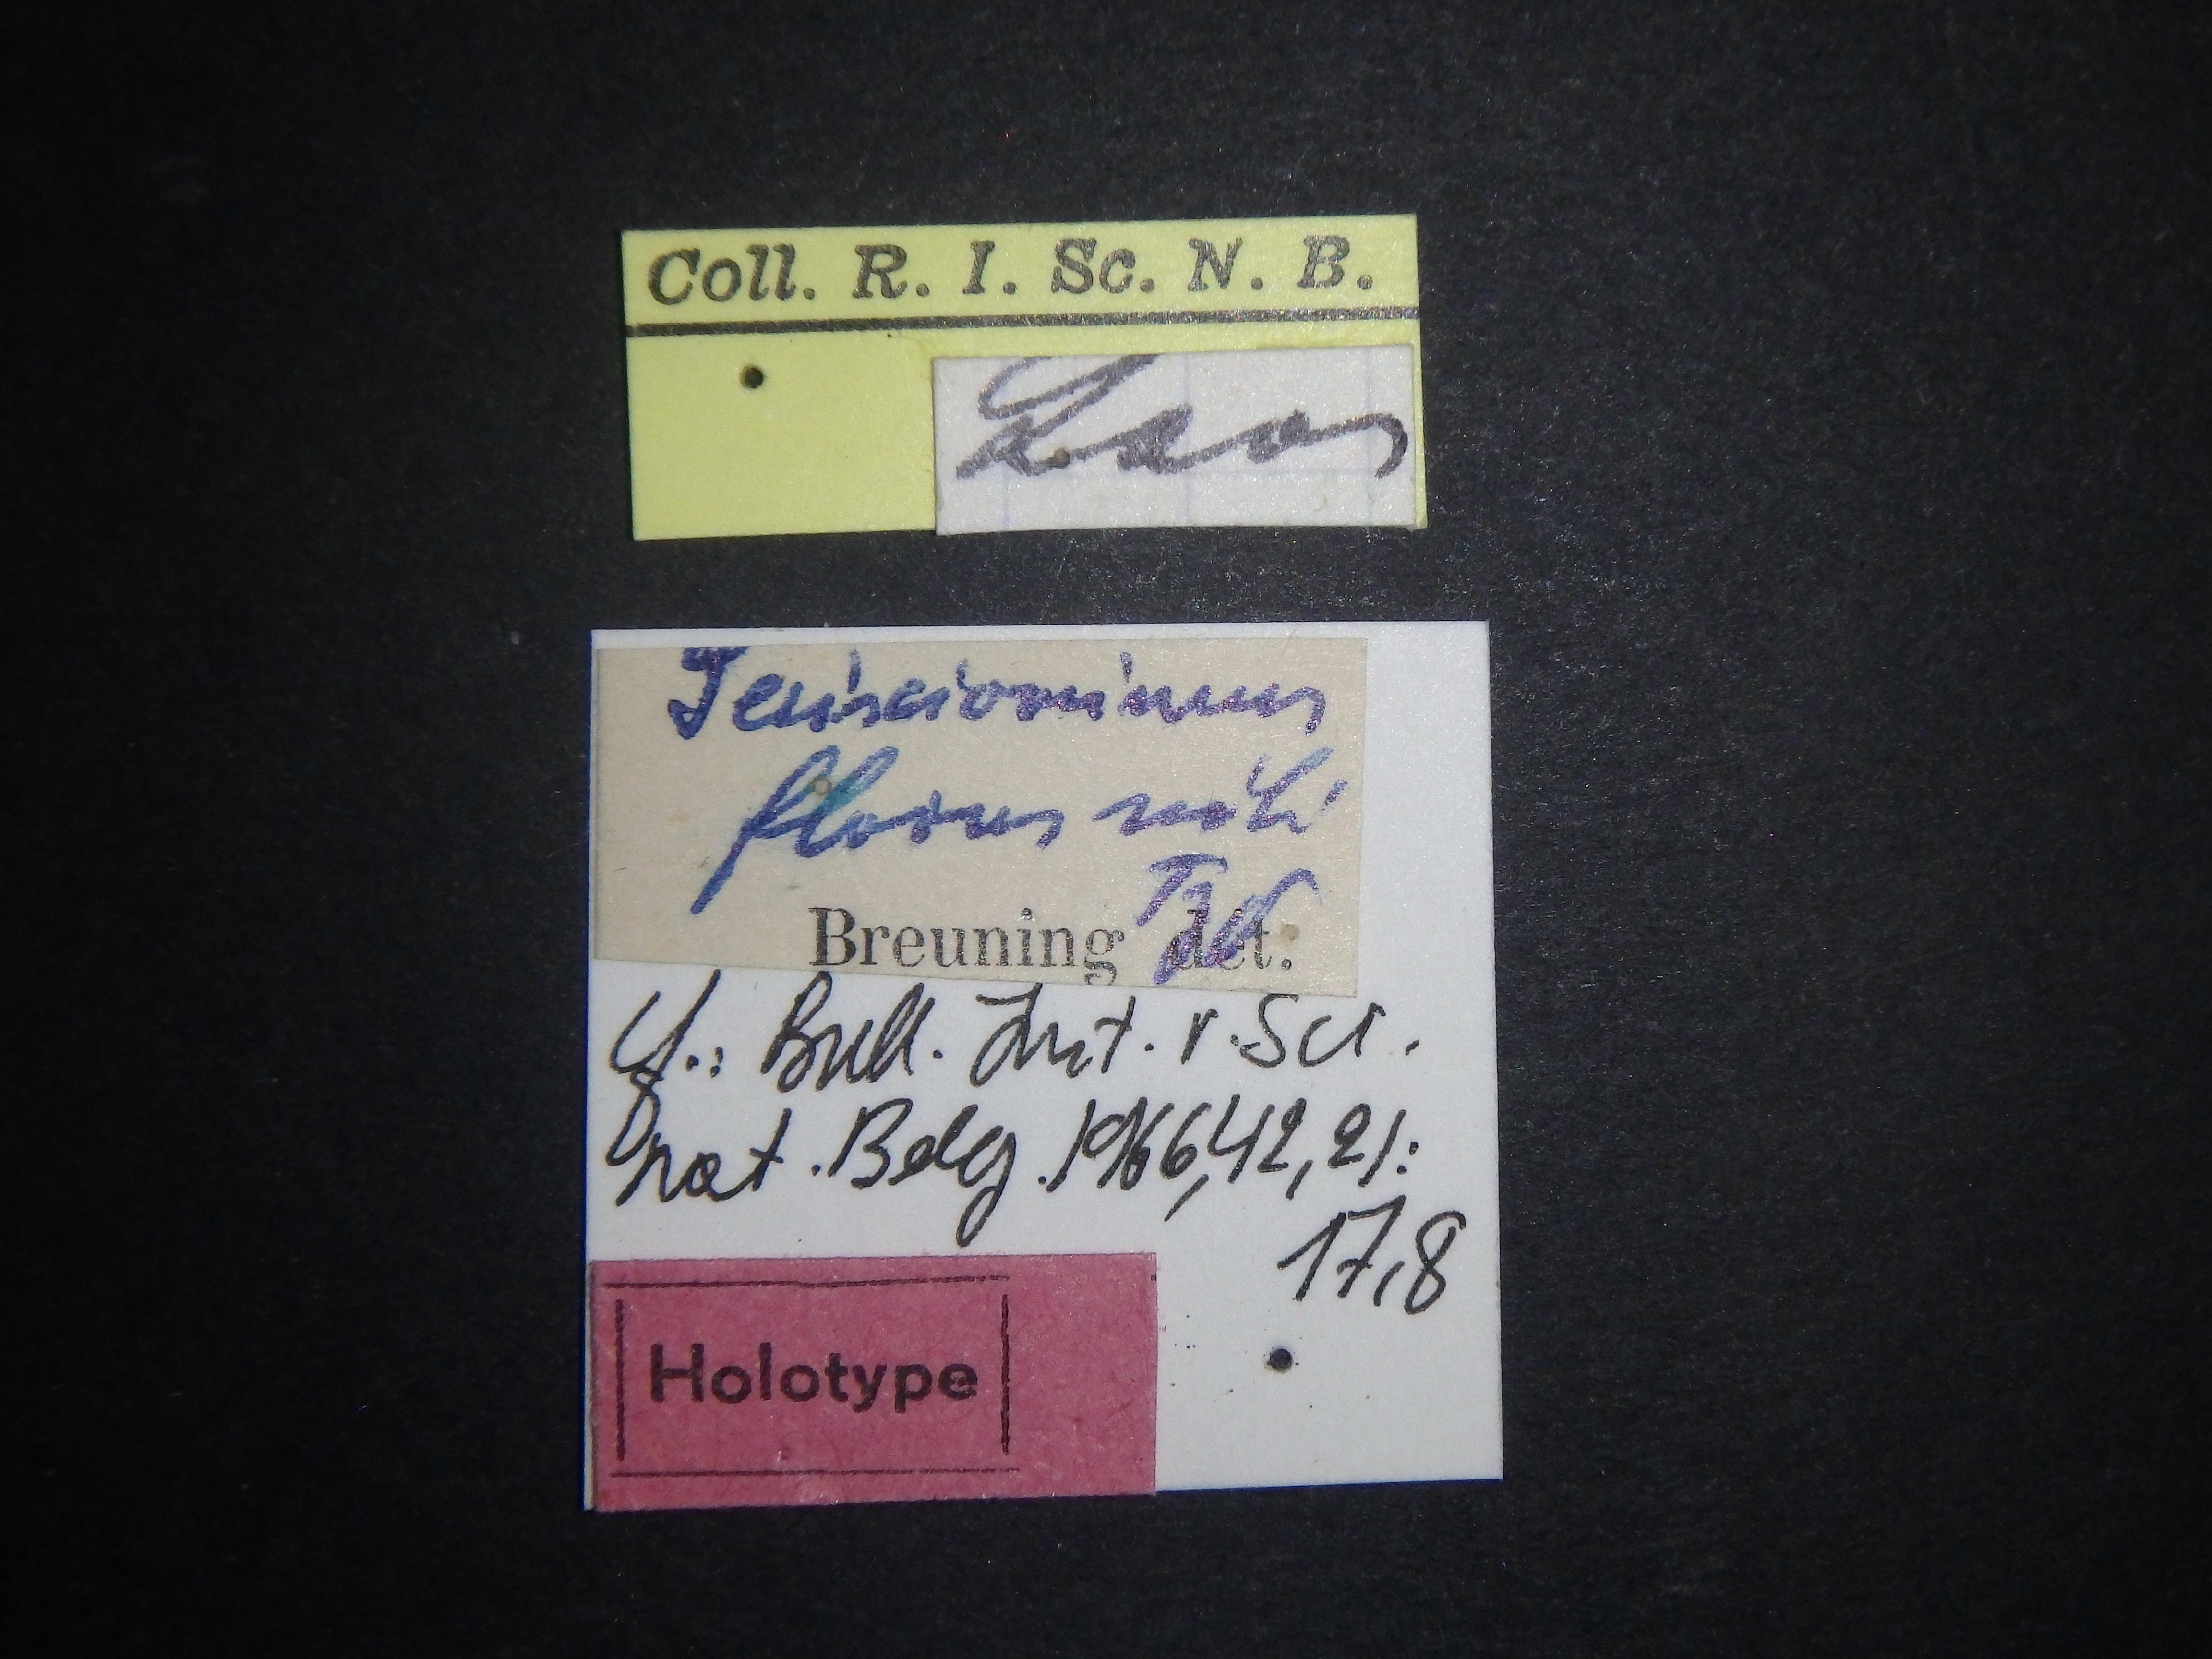 Serixiomimus flavus ht Labels.JPG